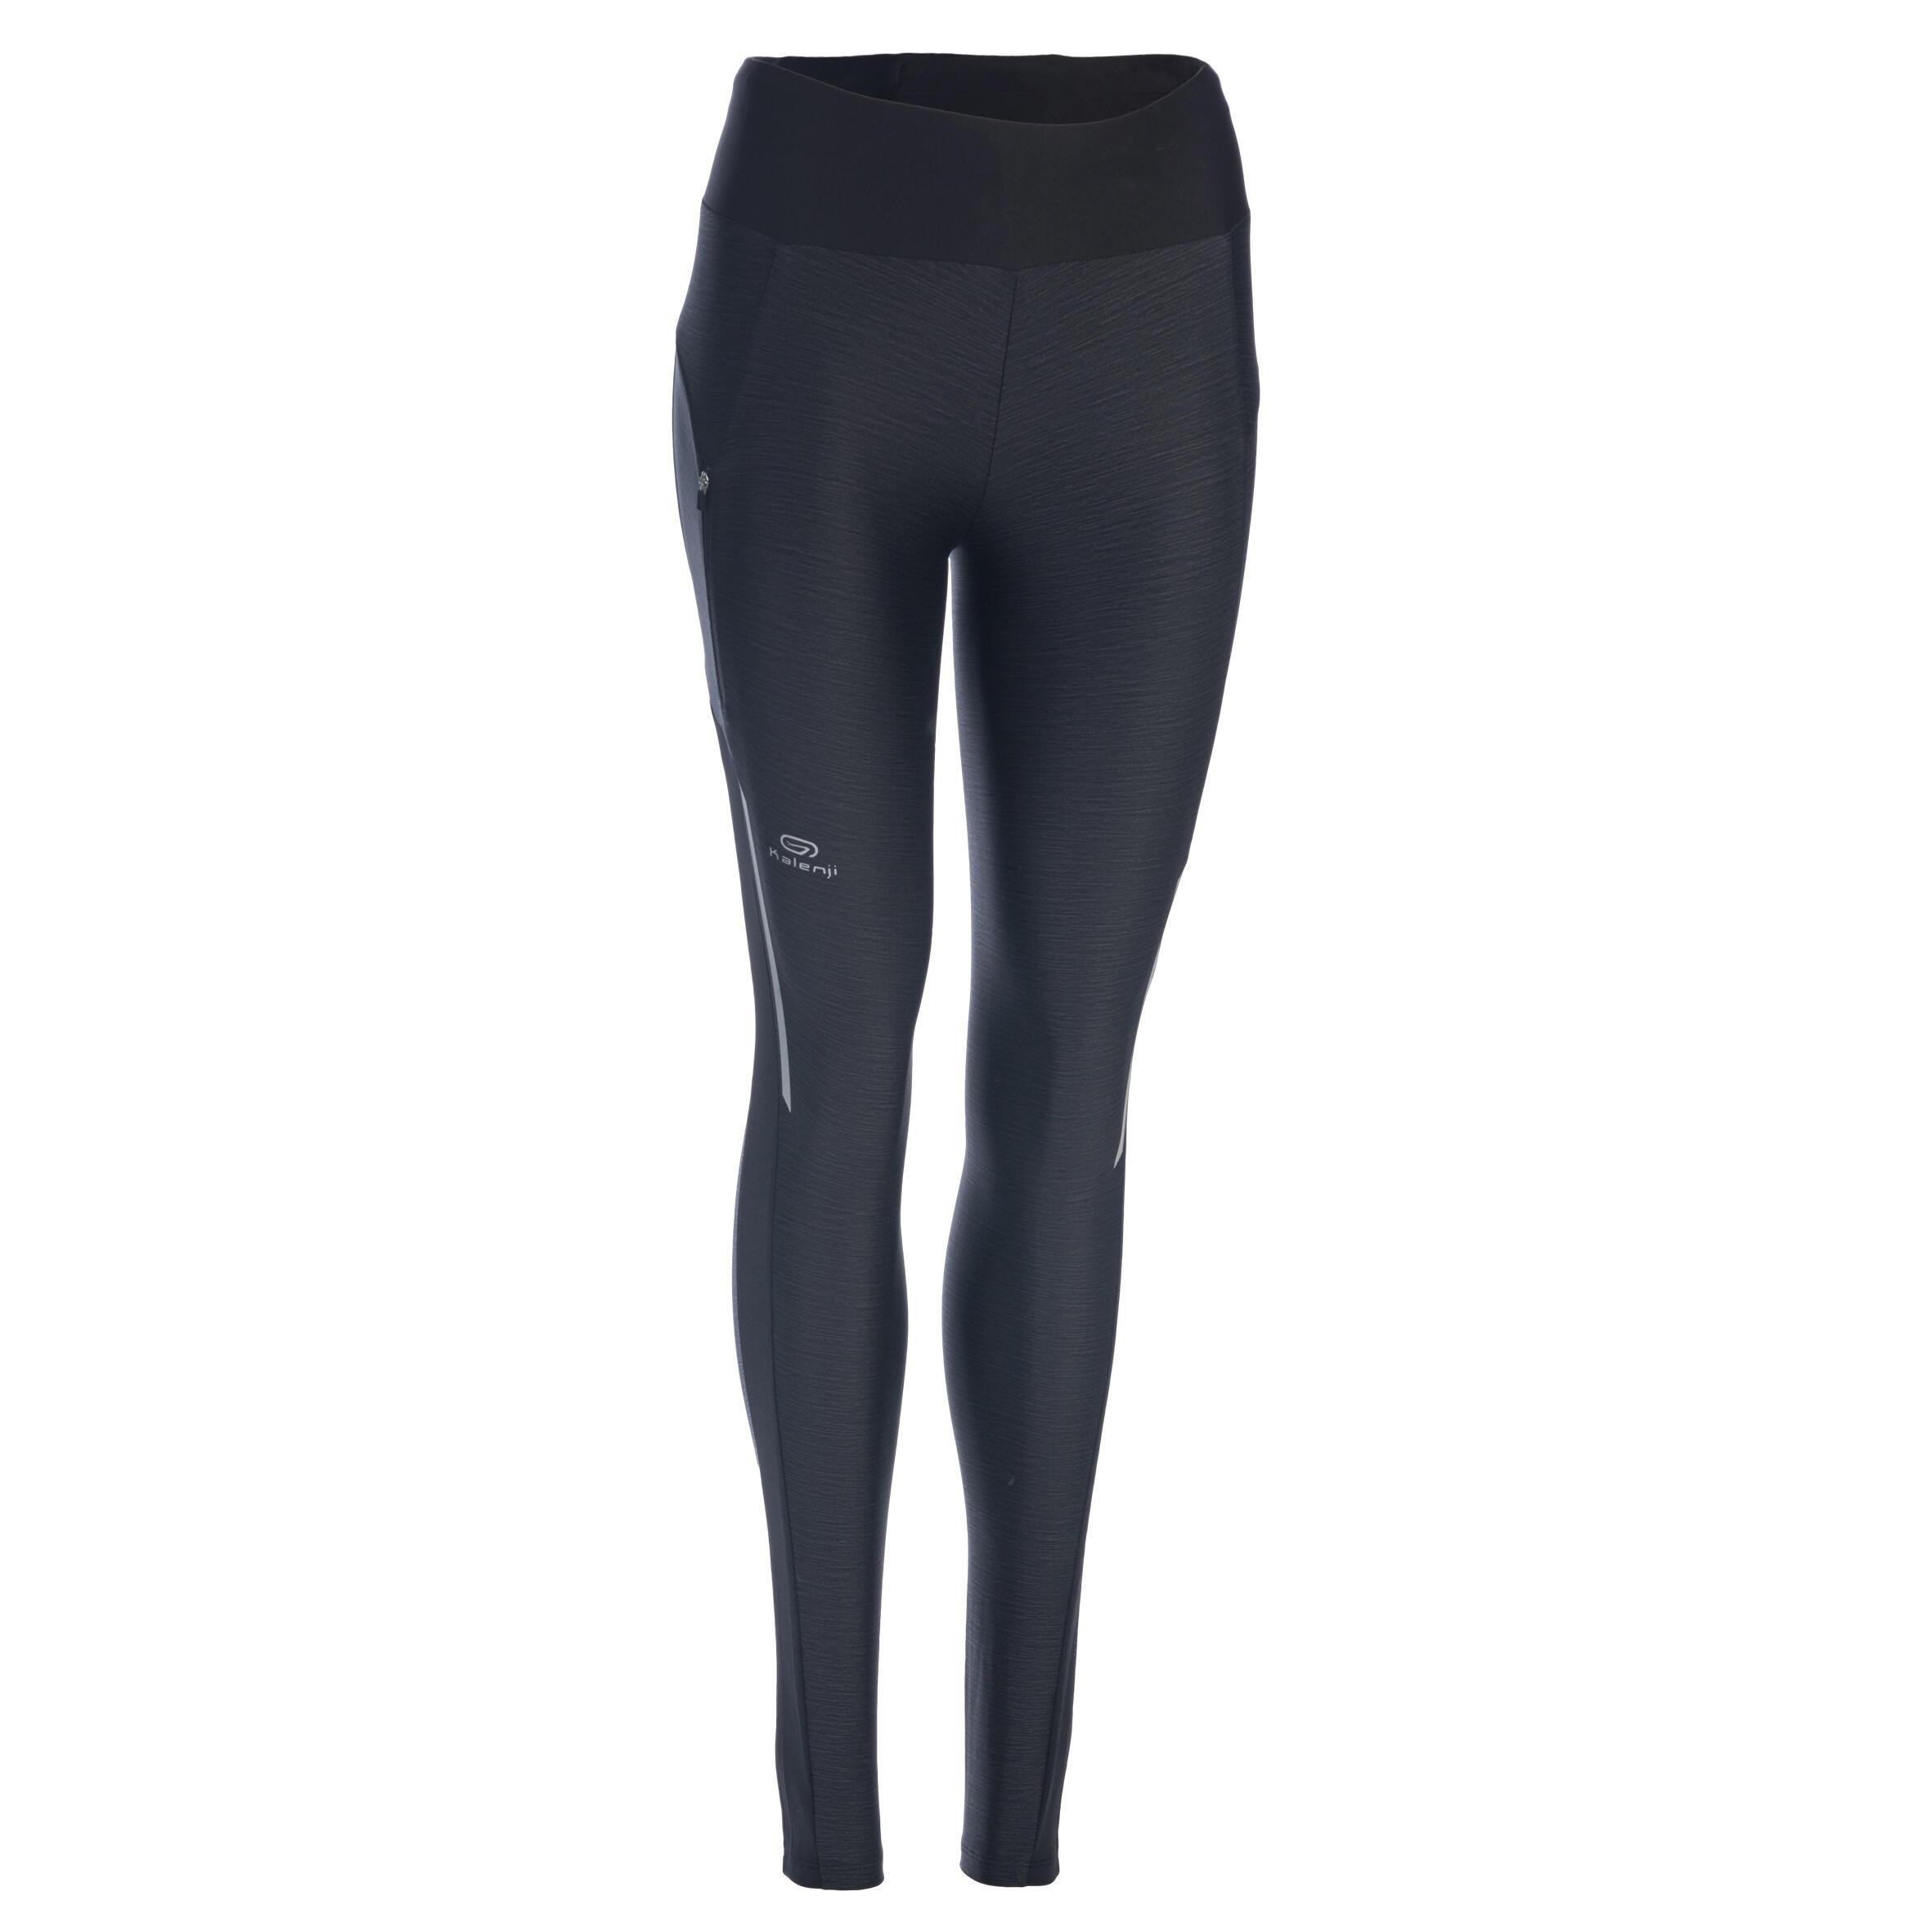 Celana Ketat Lari 7/8 Run Dry + Wanita Hitam